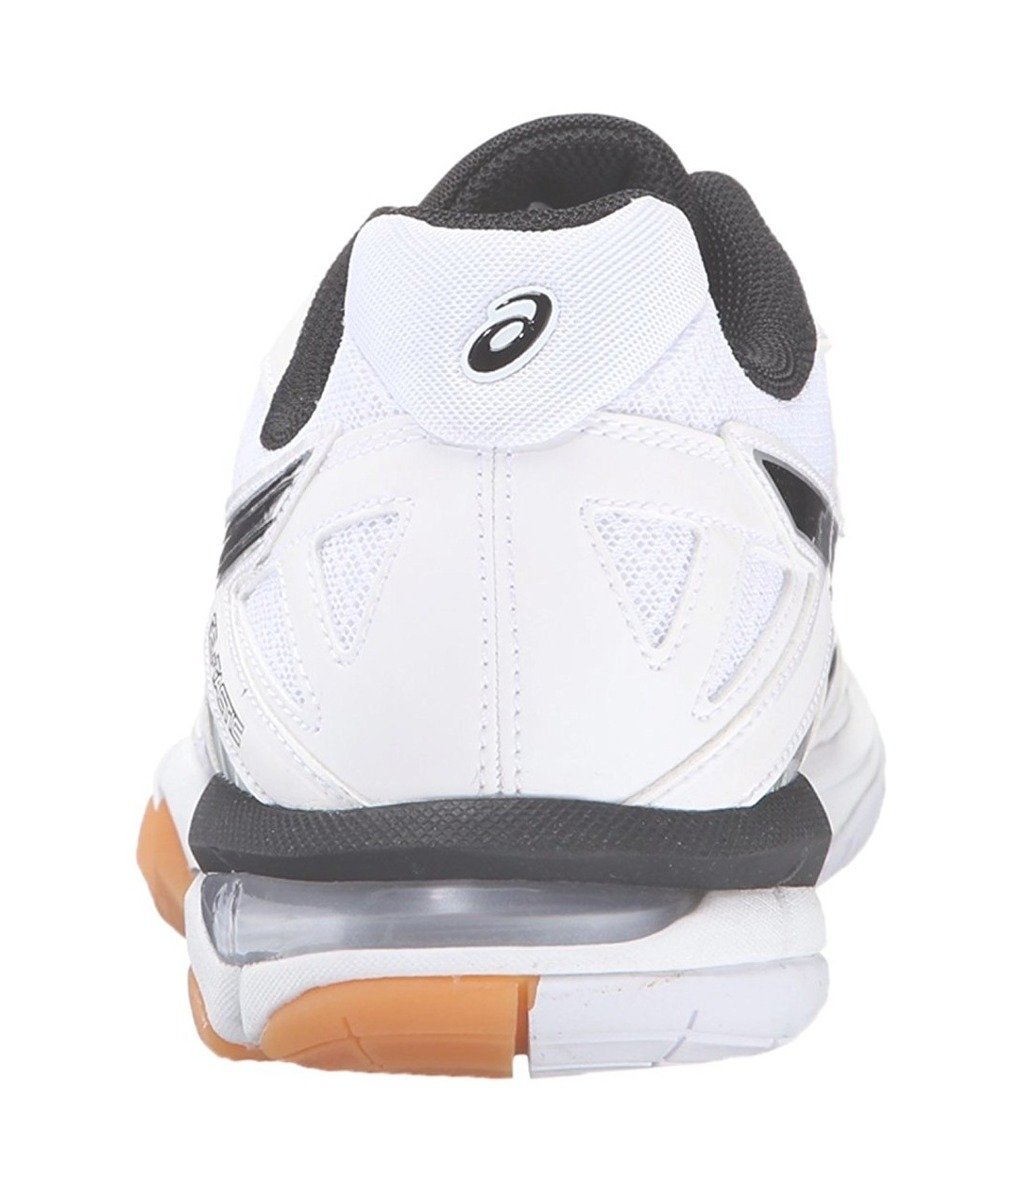 d429987f72 Asics Gel Tactic Voleibol Handball Training Tenis Squash -   259.900 ...